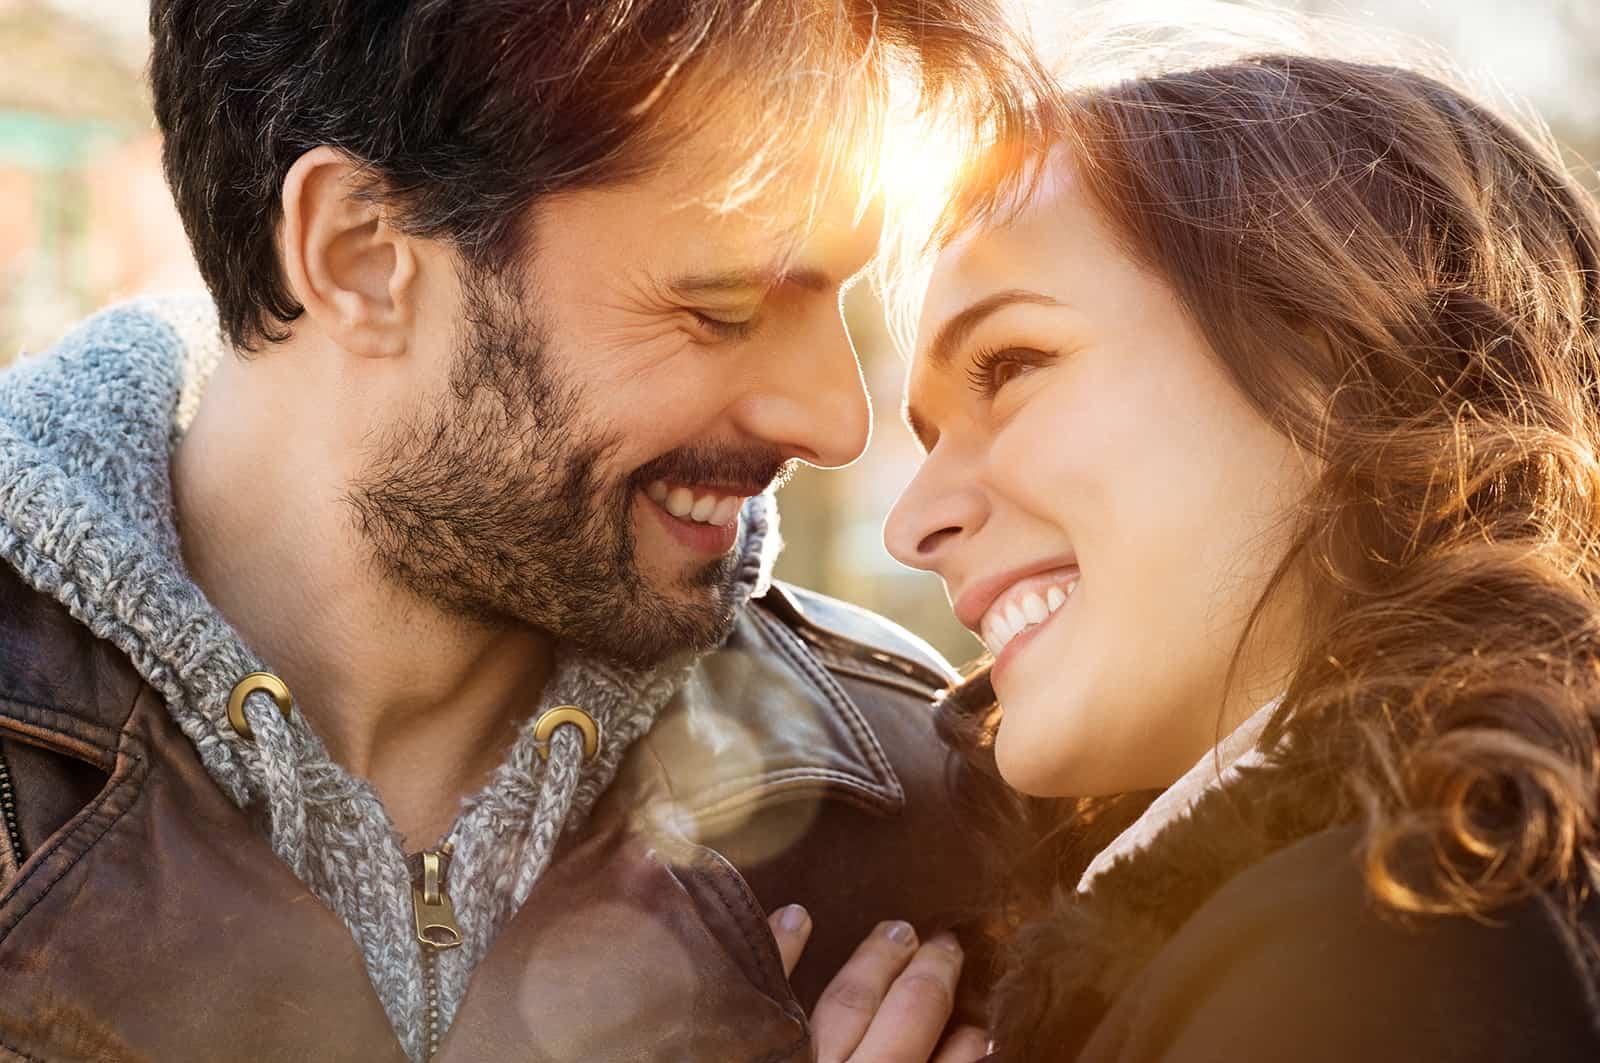 couple souriant en se regardant tout en se câlinant